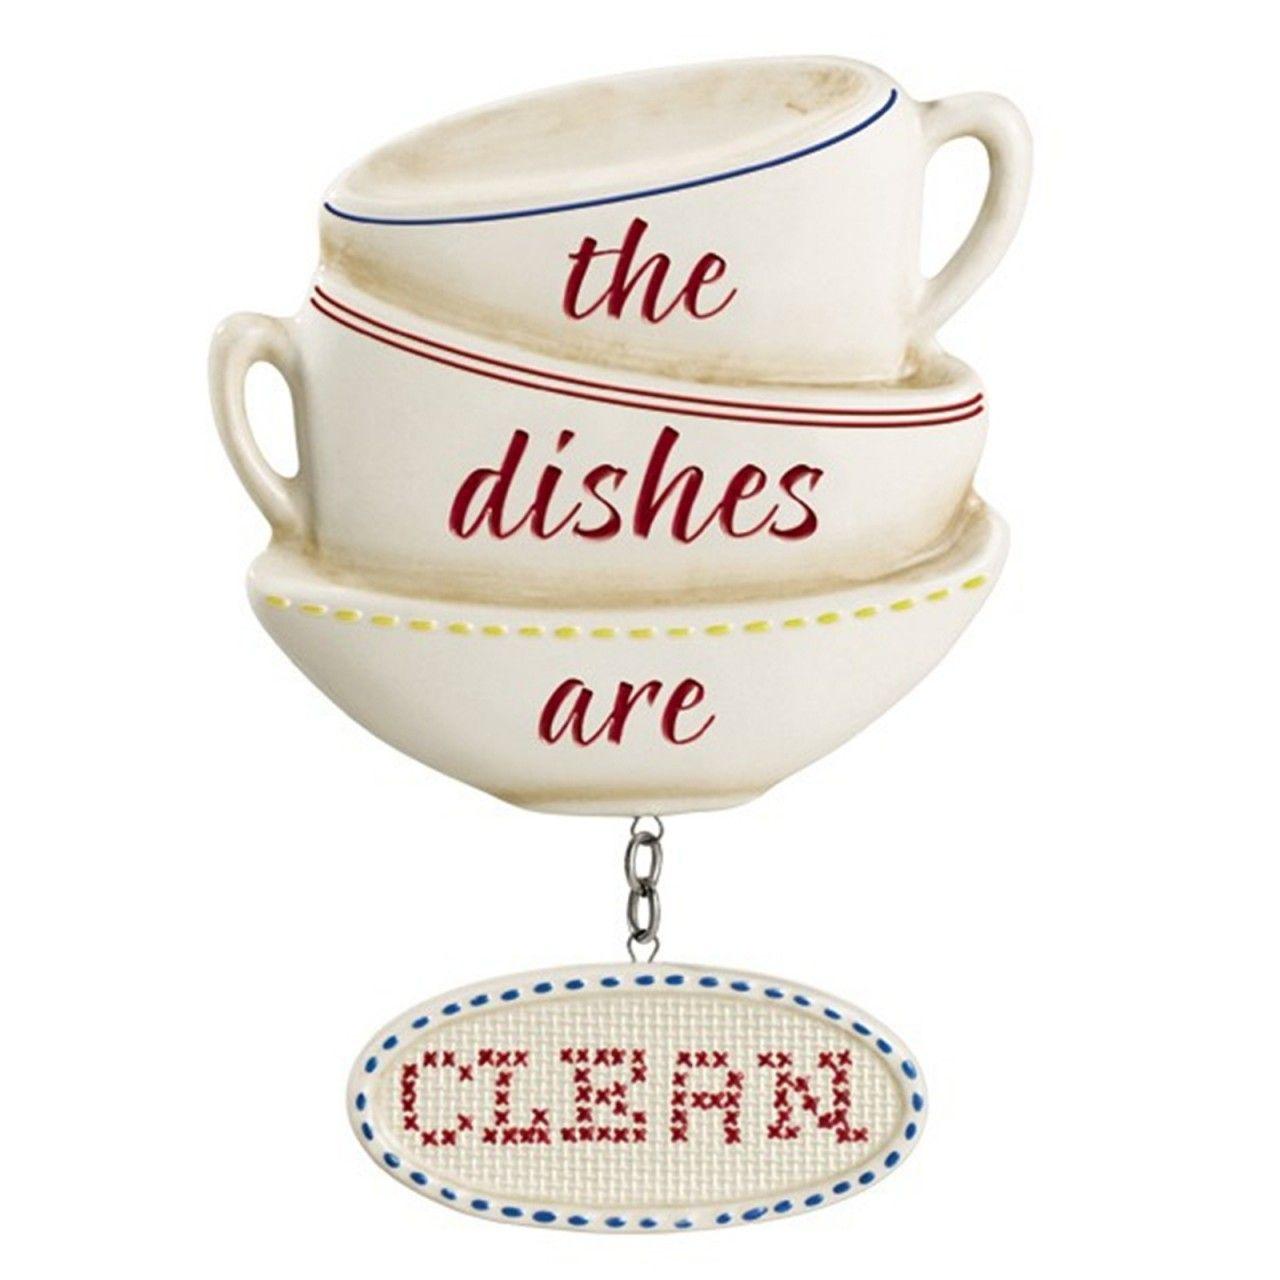 Pin by Kim Krasny on Decor   Pinterest   Dishwasher magnet, Coffee ...